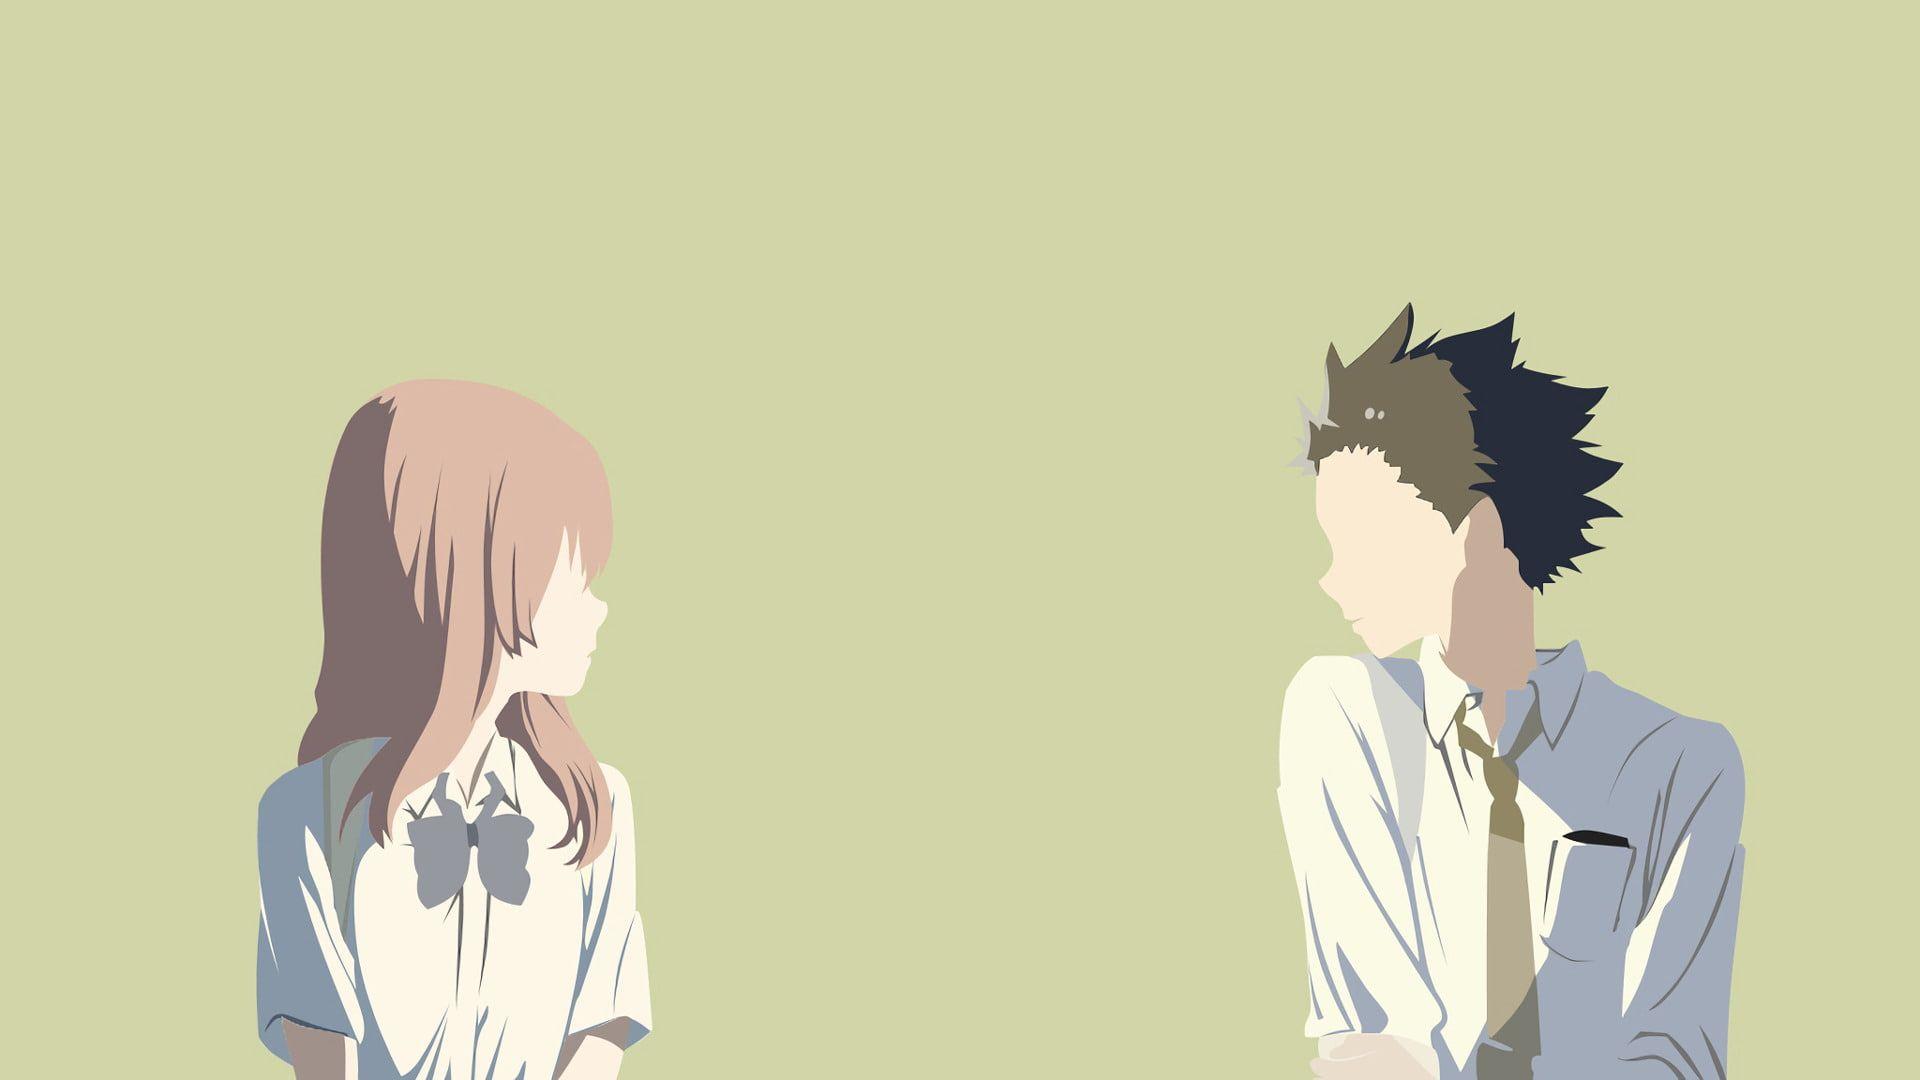 HD wallpaper: Anime, Koe No Katachi, Shouko Nishimiya, Shouya Ishida